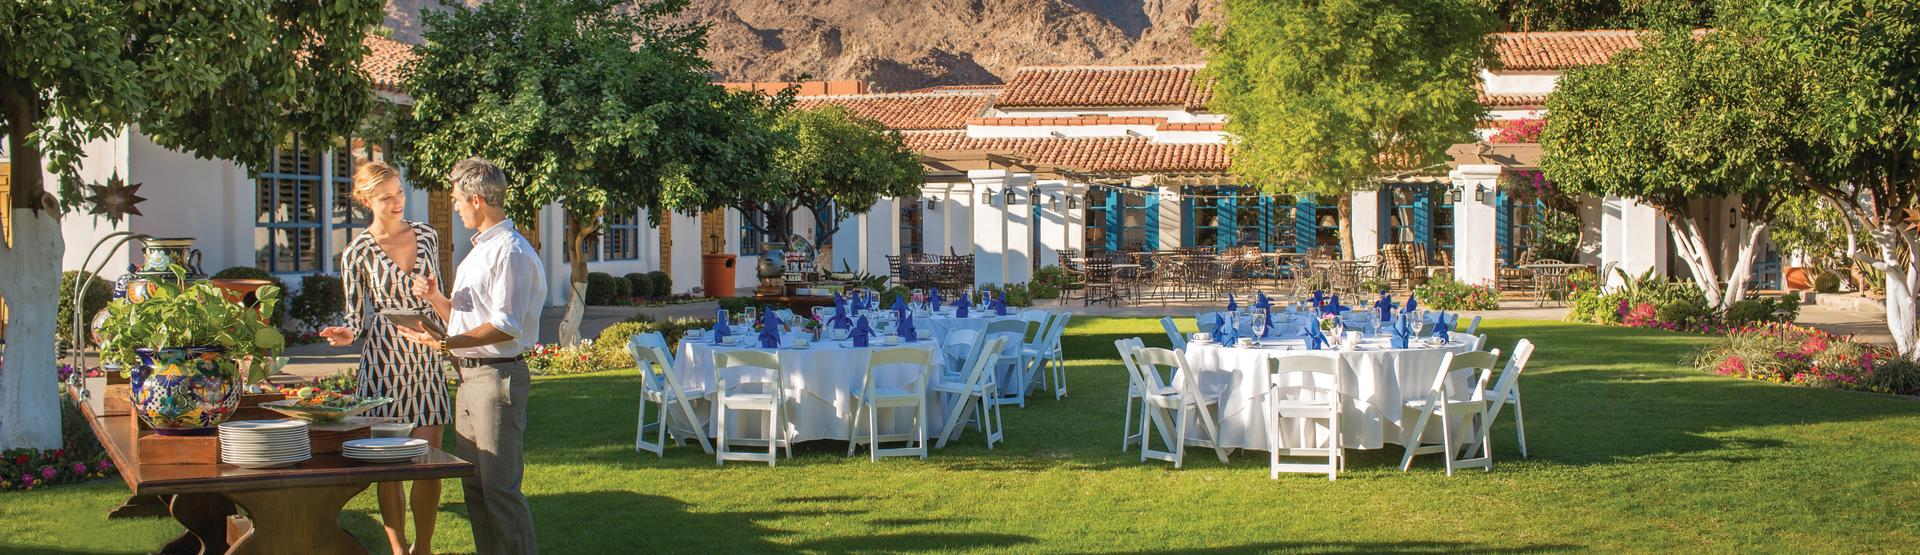 Event set up on the lawn La Quinta Resort